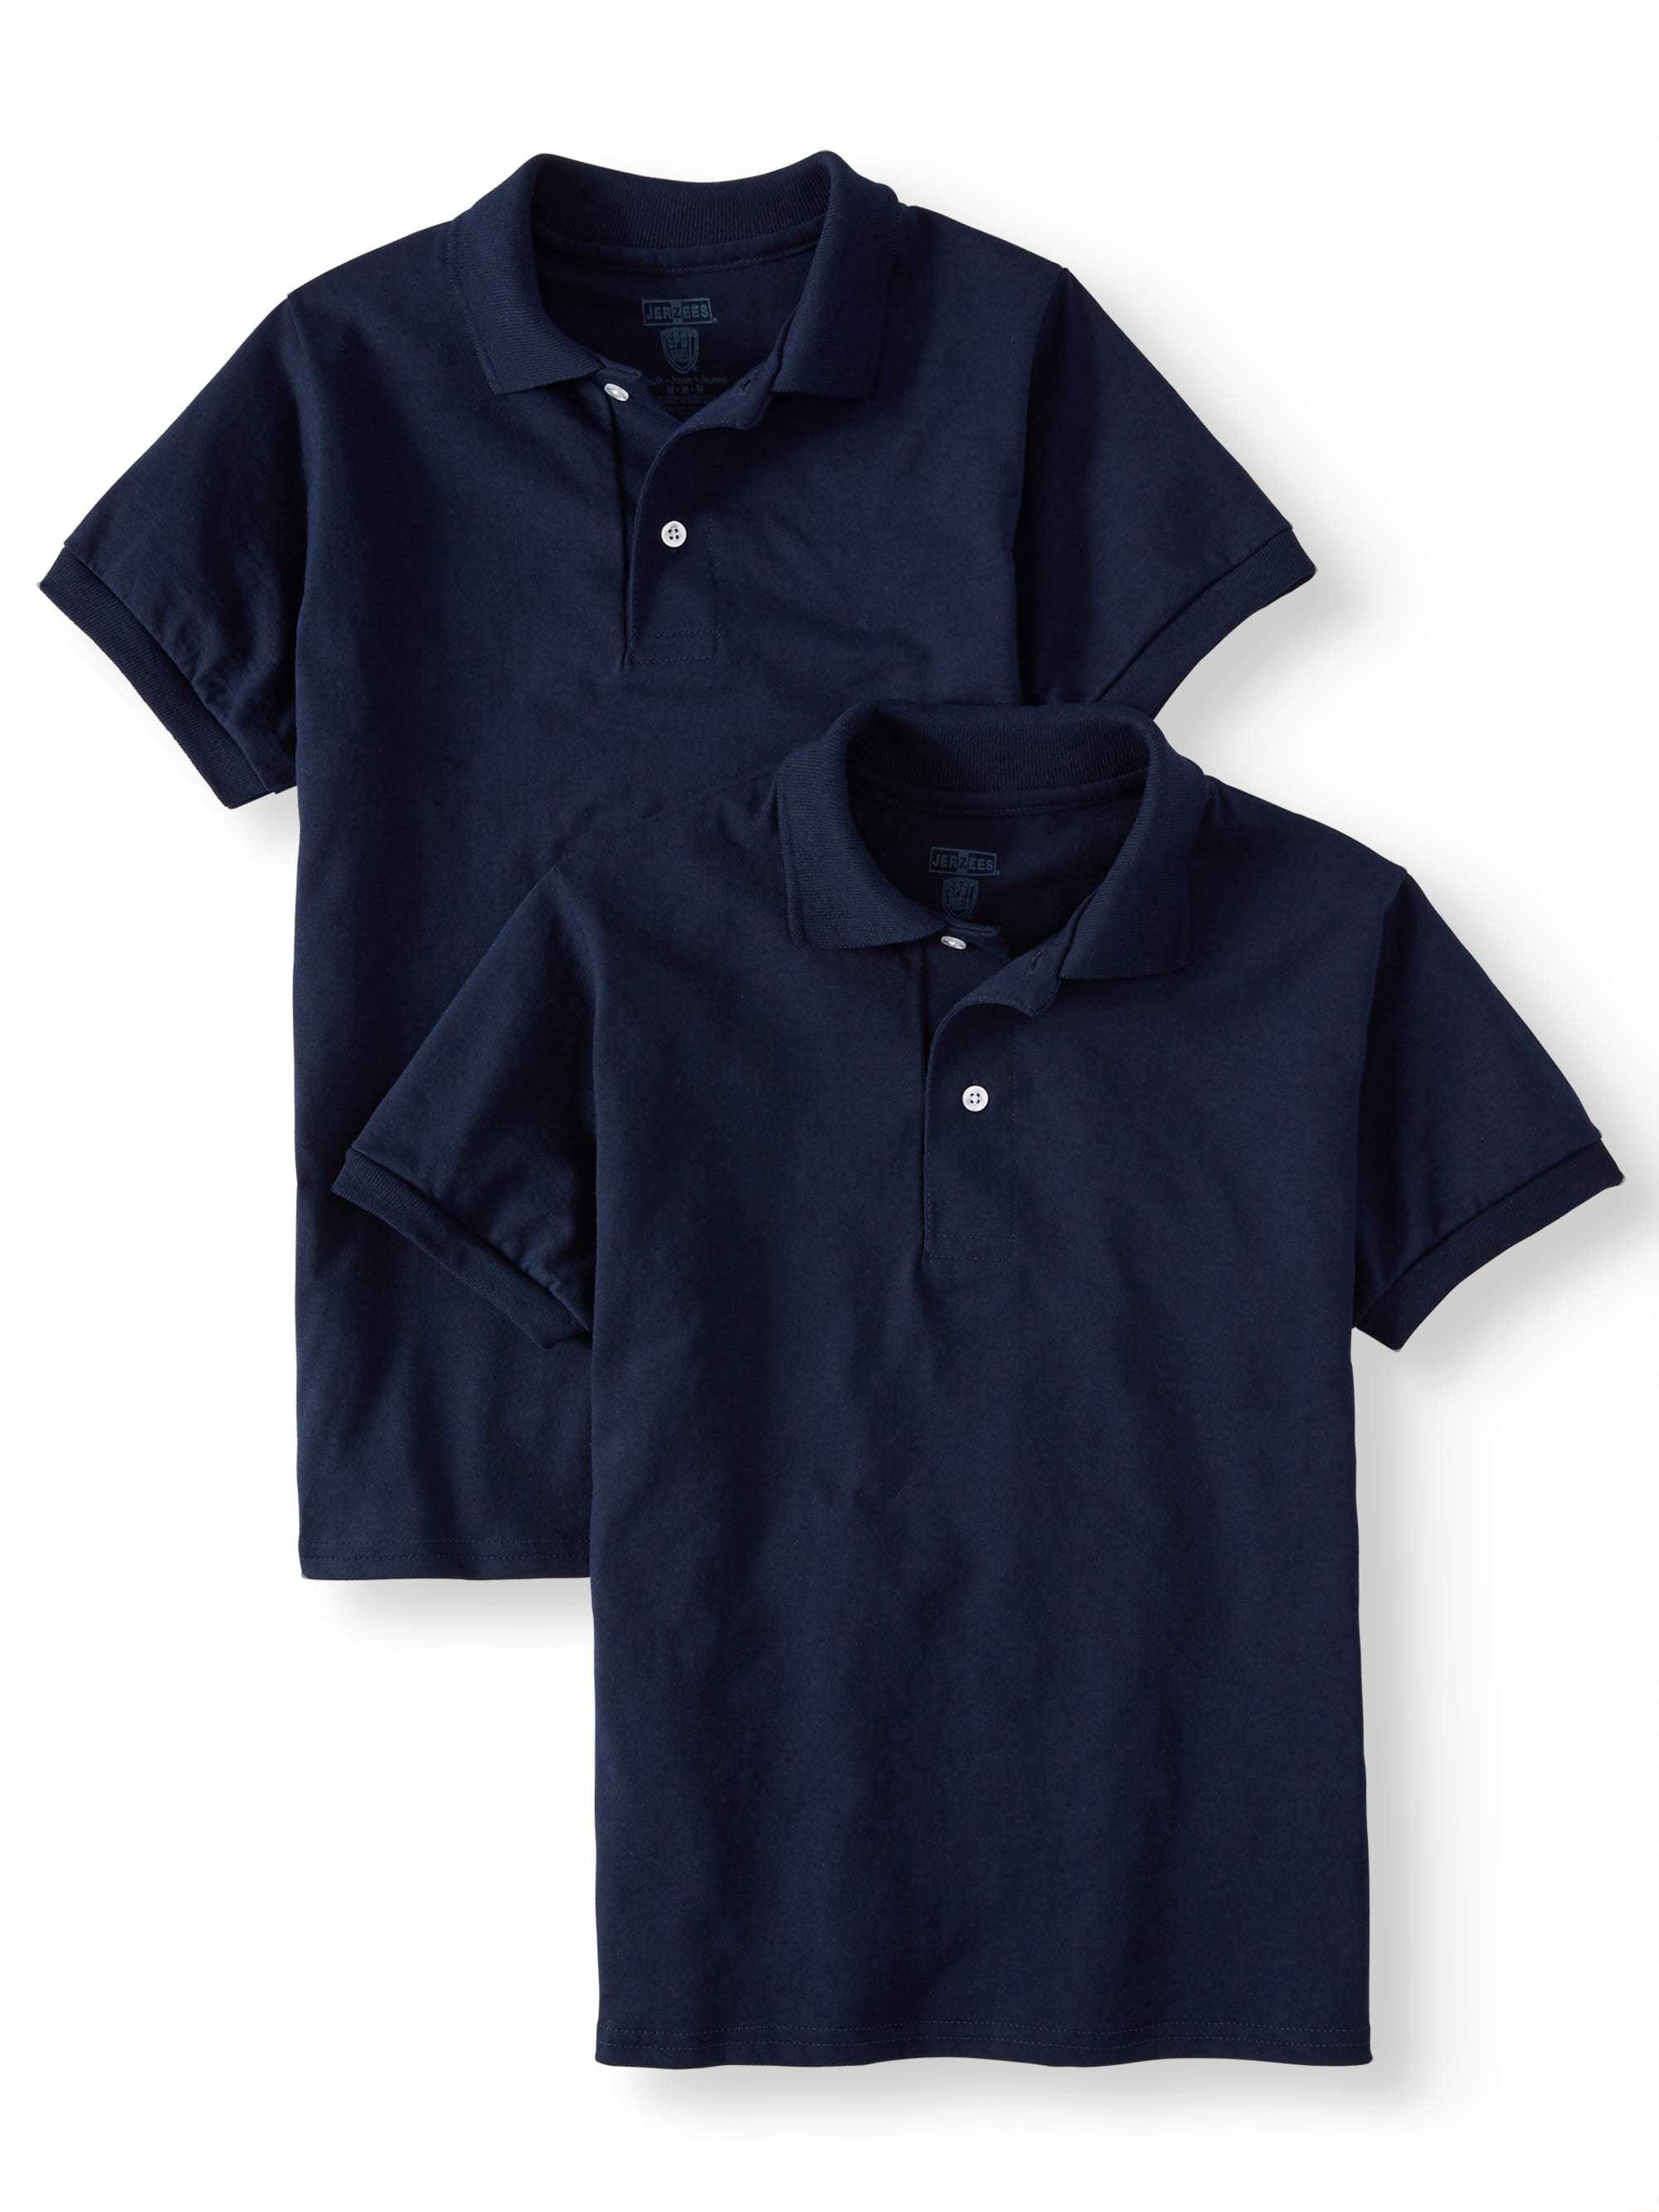 Boys' SpotShield Short Sleeve Polo Sport Shirt, 2 Pack